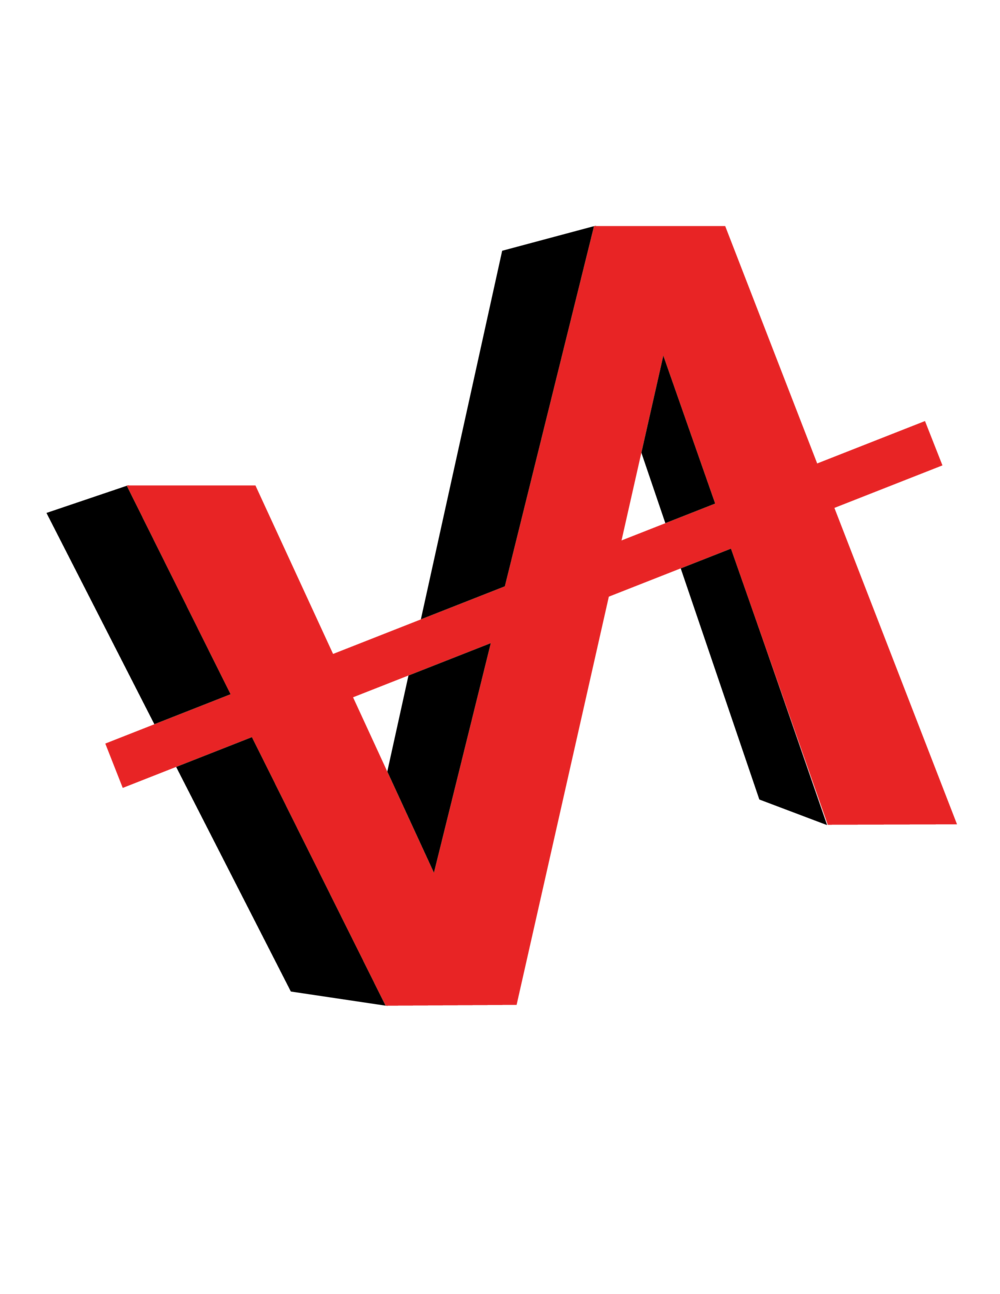 Adriana-Arriaga-logo.png